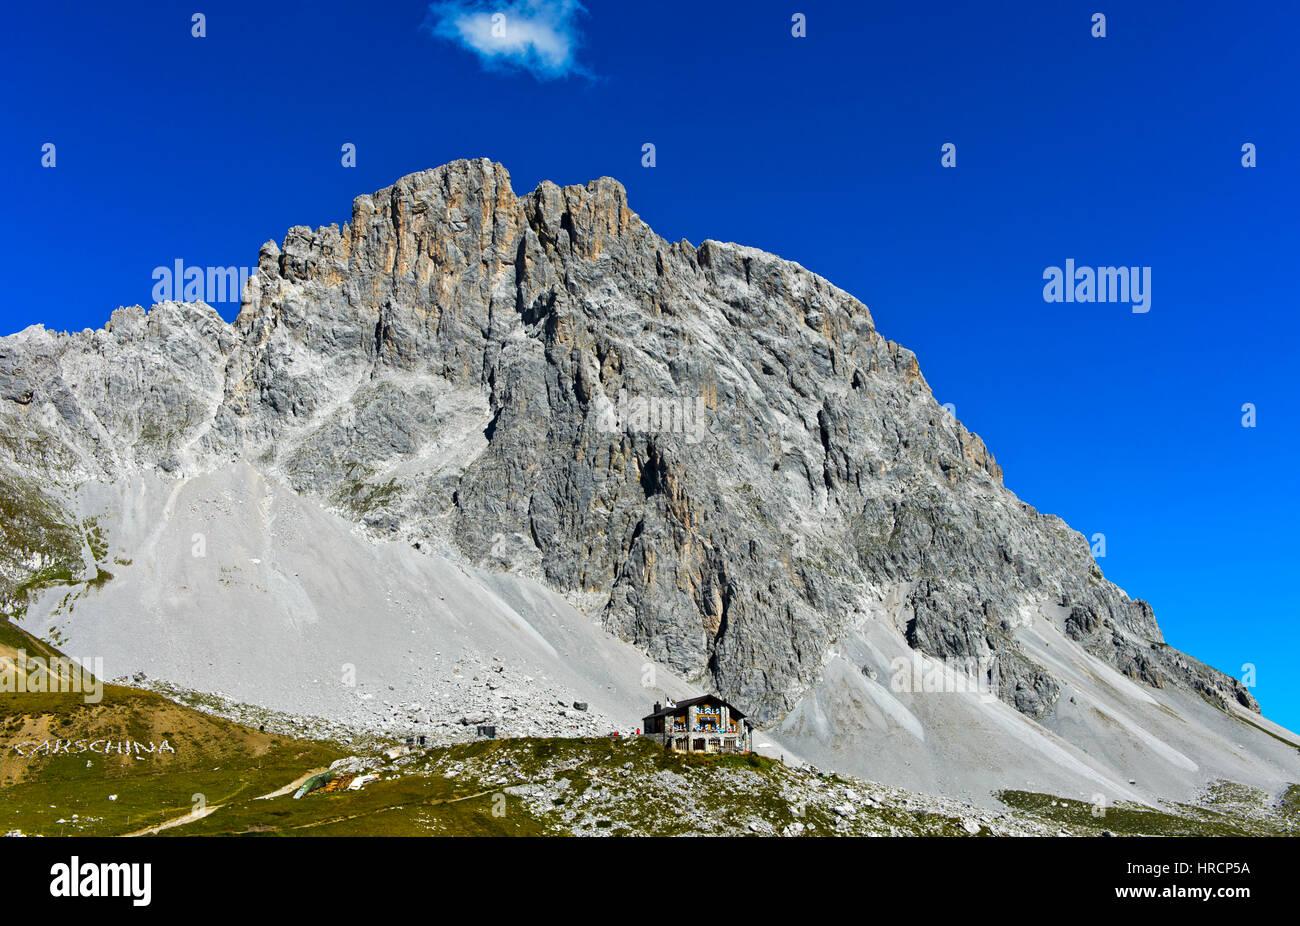 Mountain hut Carschinahütte,south face of the Sulzfluh peak, St. Antönien, Prättigau, Graubünden, - Stock Image